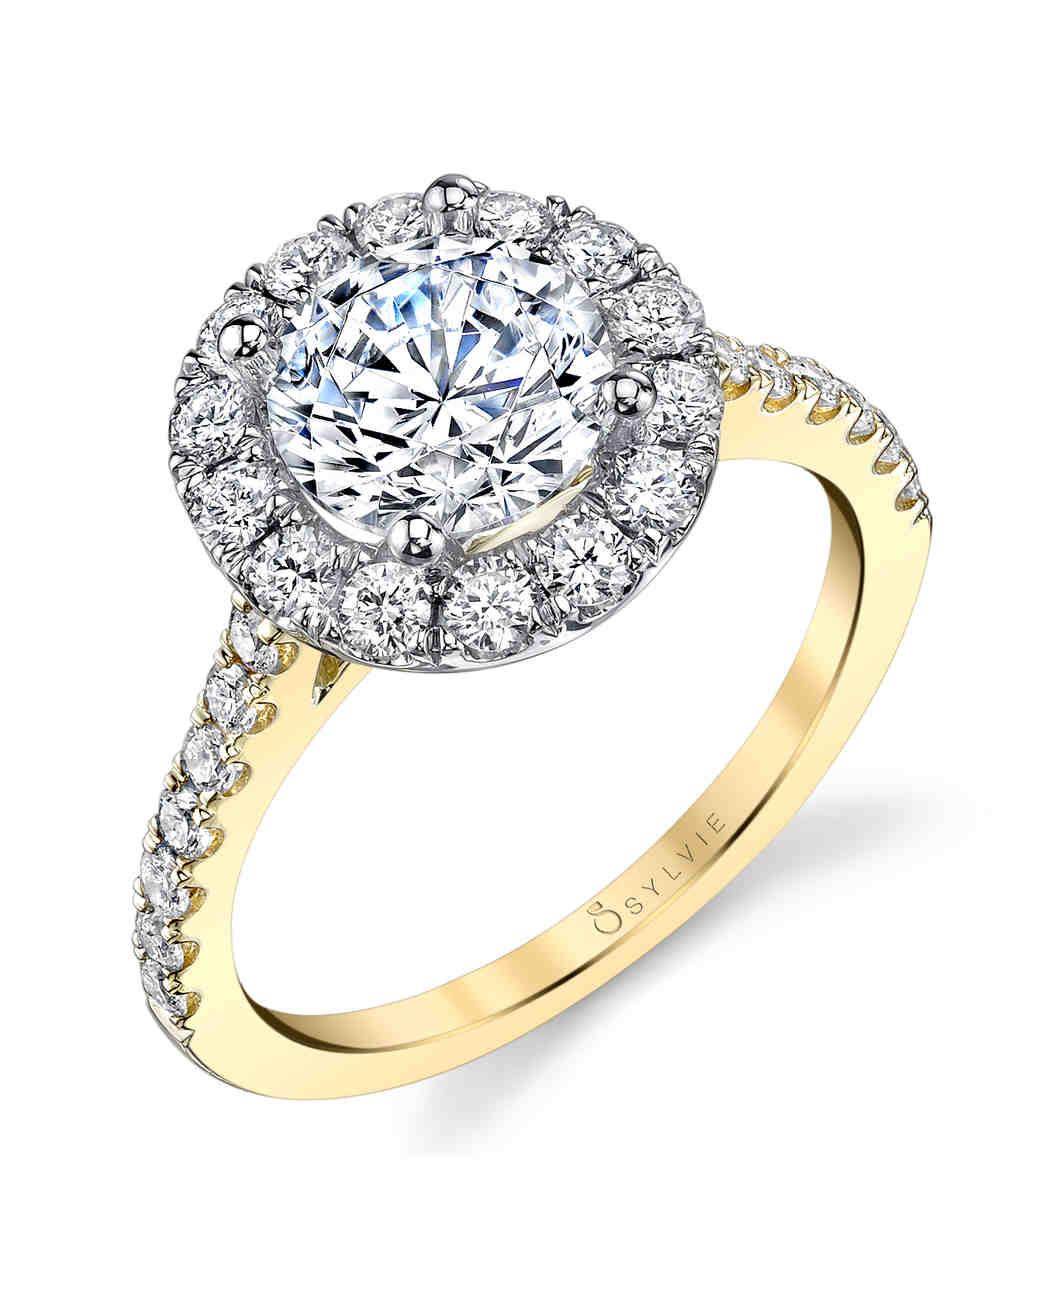 yellow gold engagement rings | martha stewart weddings gzpuivz